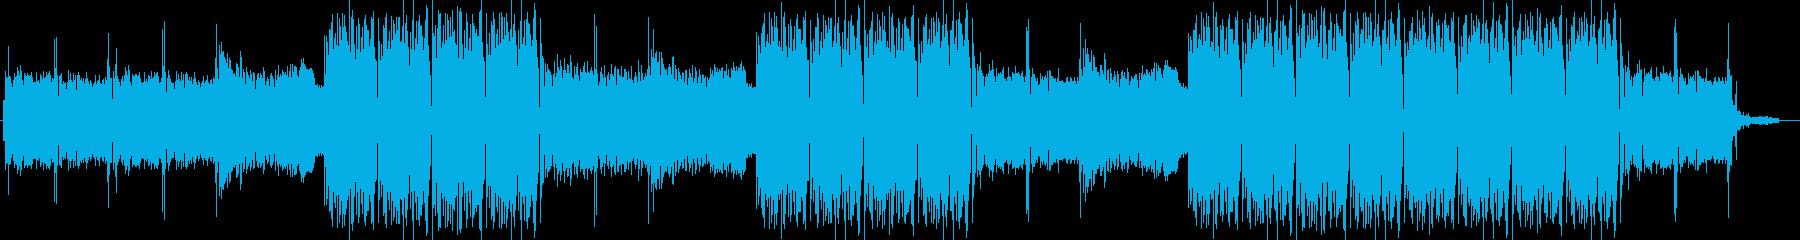 EDMクラブ系ダンスミュージック-04の再生済みの波形